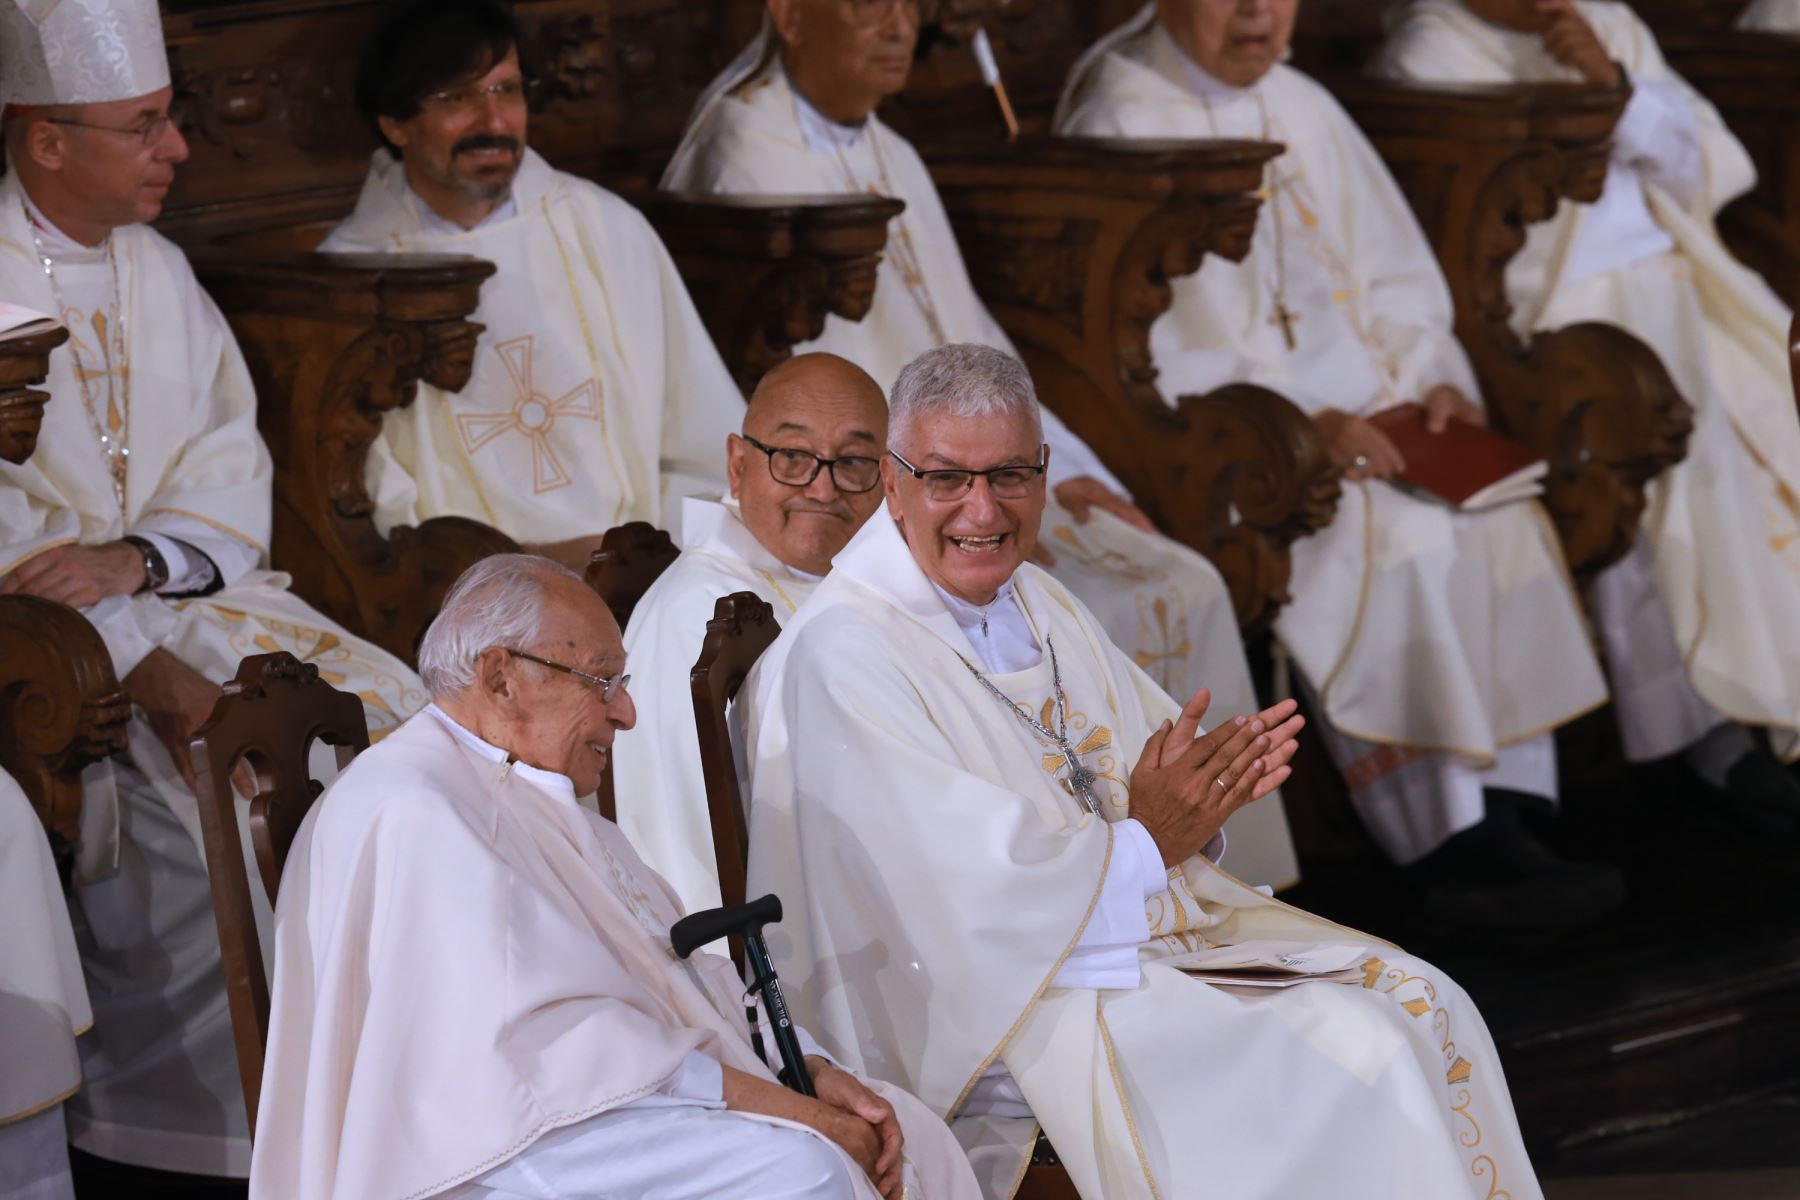 Ordenación Episcopal y Toma de Posesión de Monseñor Carlos Castillo Mattasoglio como Arzobispo de Lima Foto: ANDINA/Norman Córdova